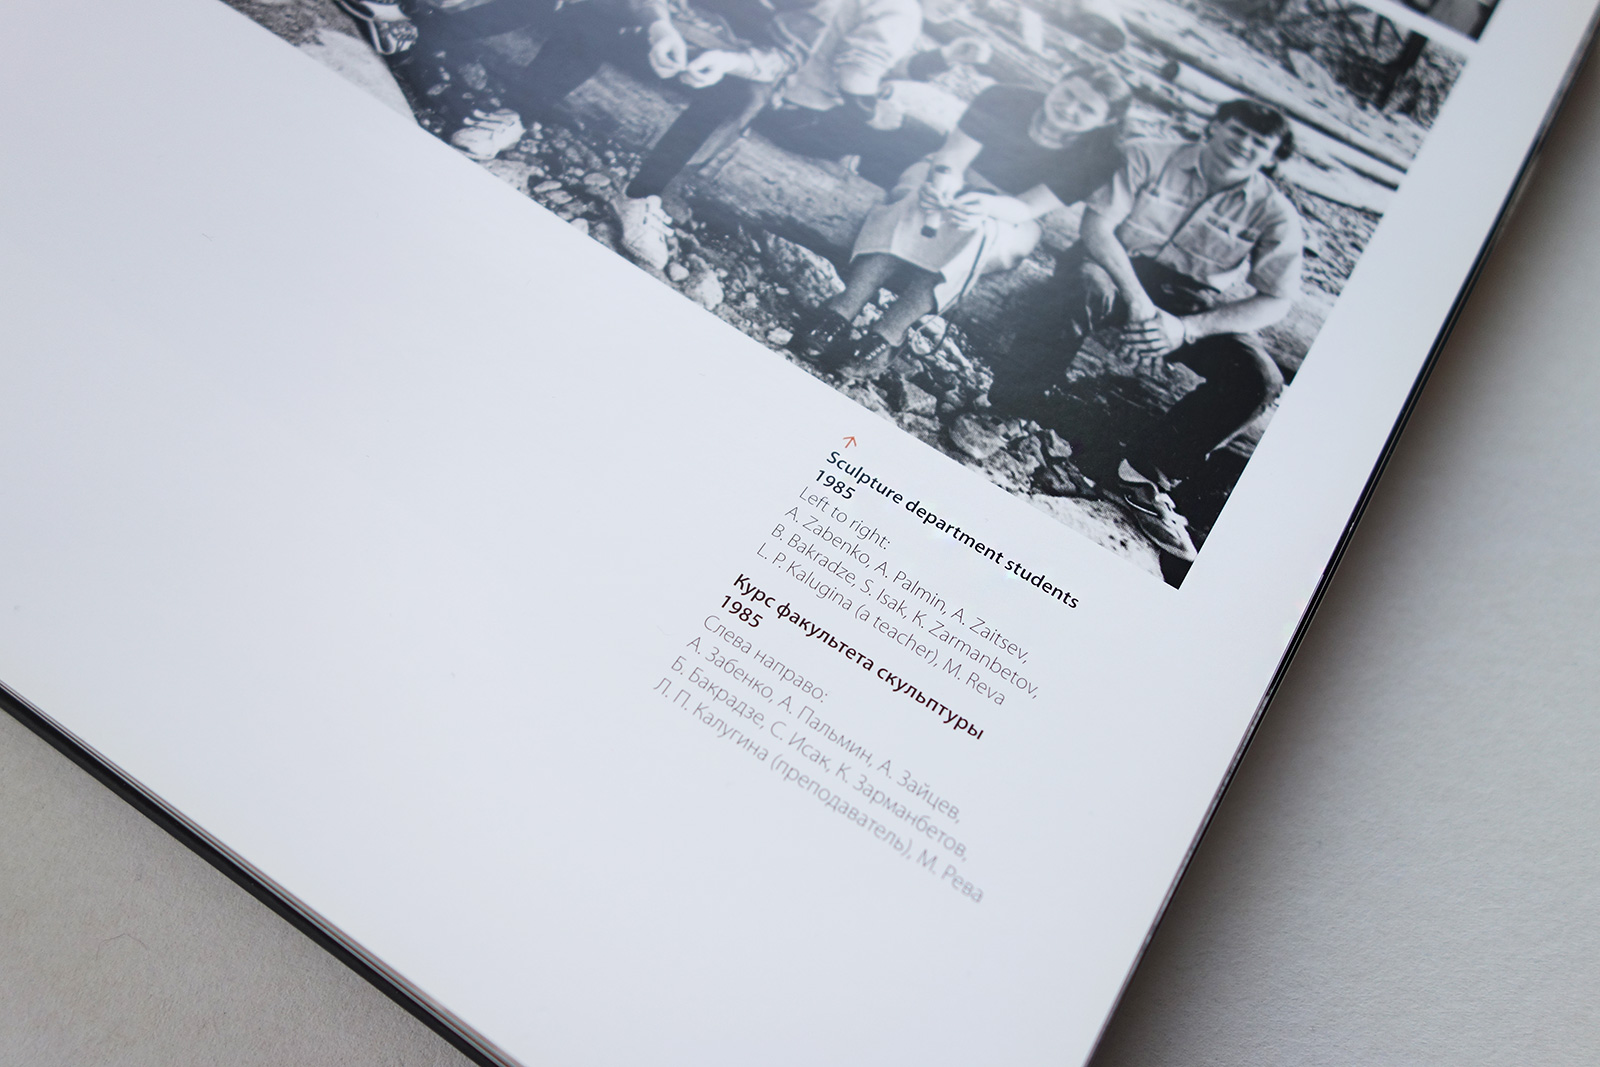 Asgard Branding, art album, design, print, printed publications, book design, Mikhail Reva